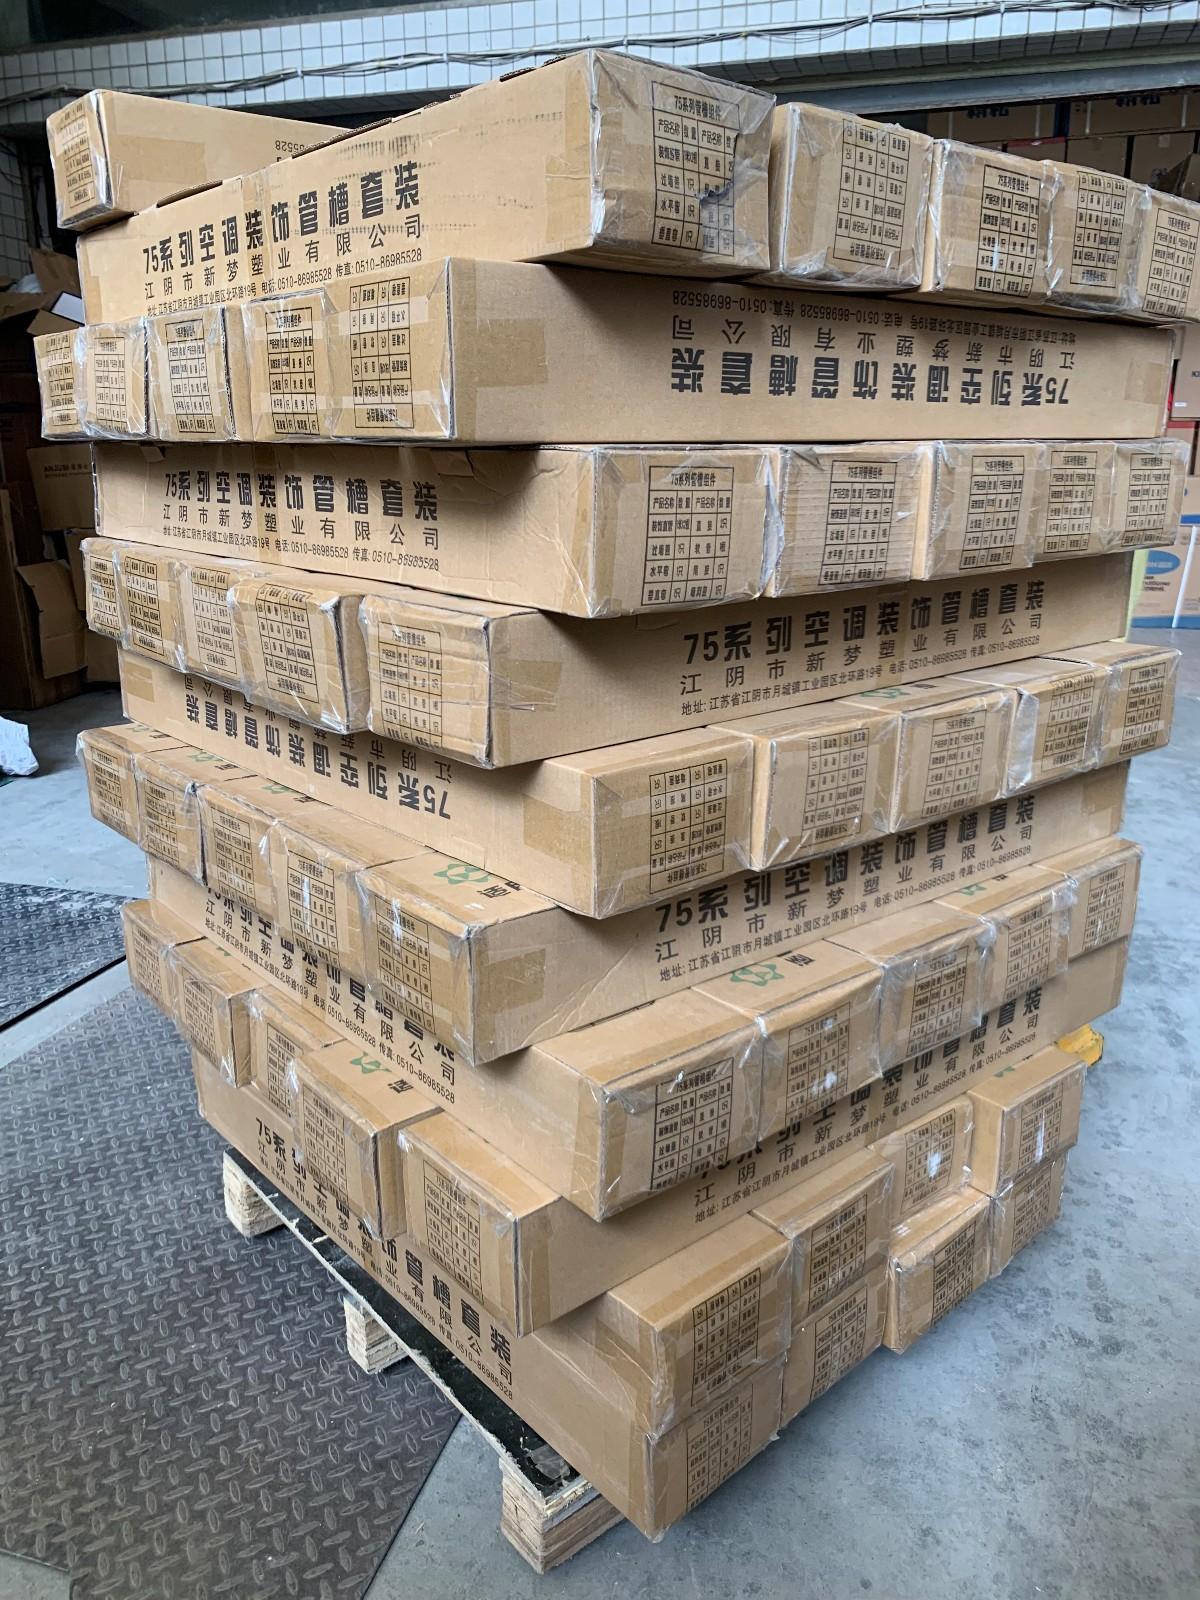 HL75成套 8件套 (2M直管、直接、其它各1只)1.5-3匹